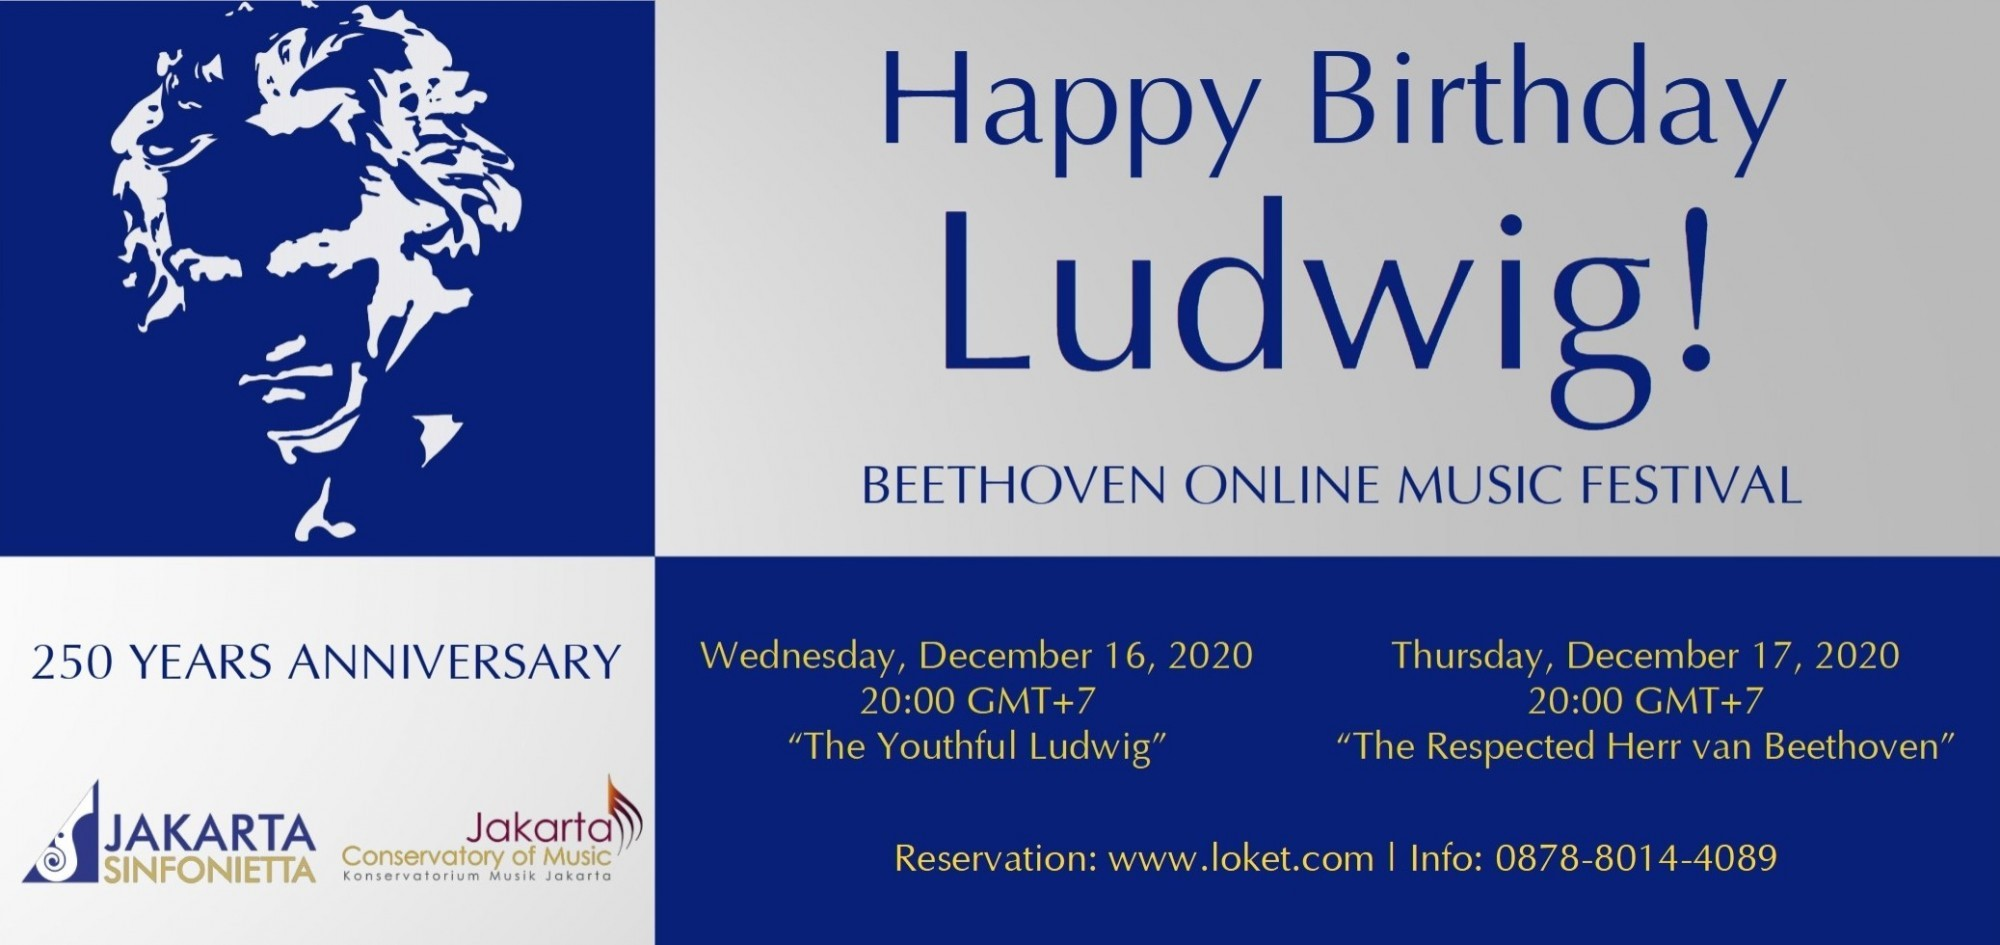 Happy Birthday Ludwig! 17 December 2020